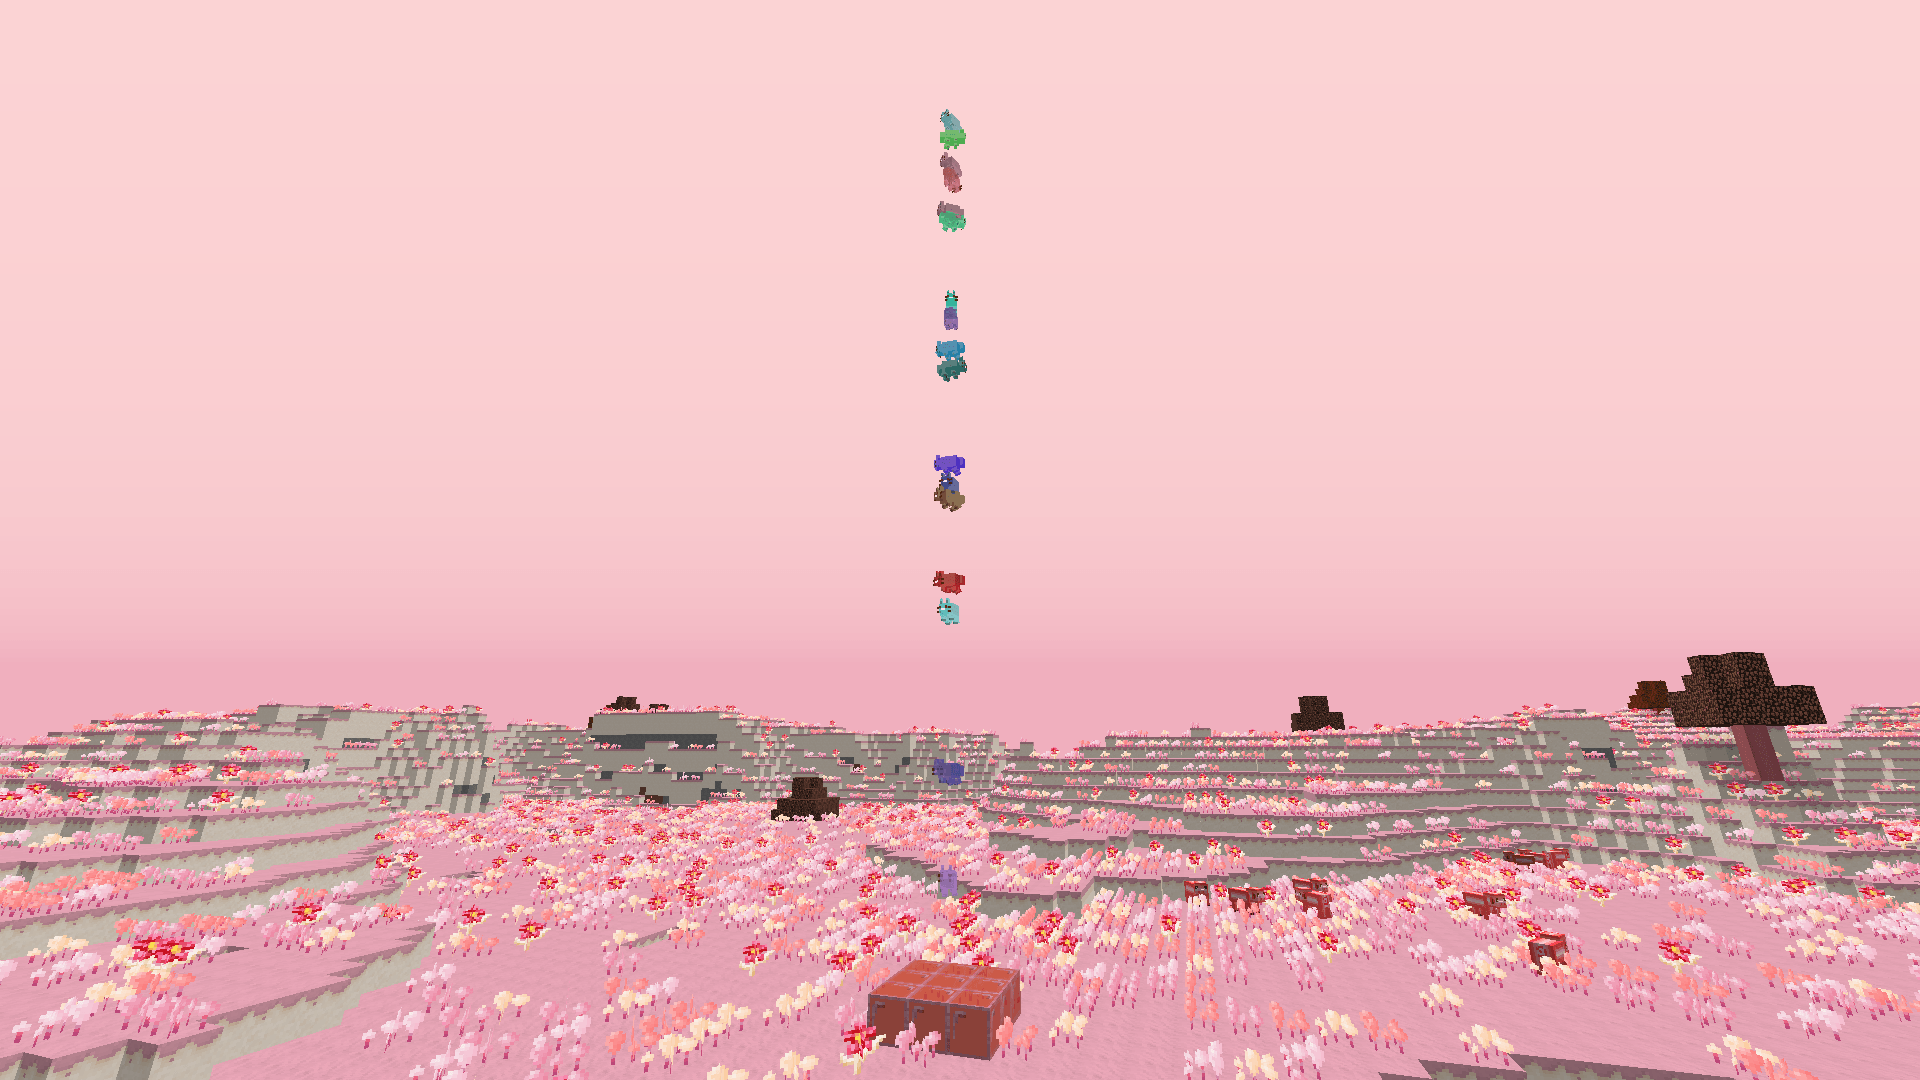 2015-02-23_00.38.37